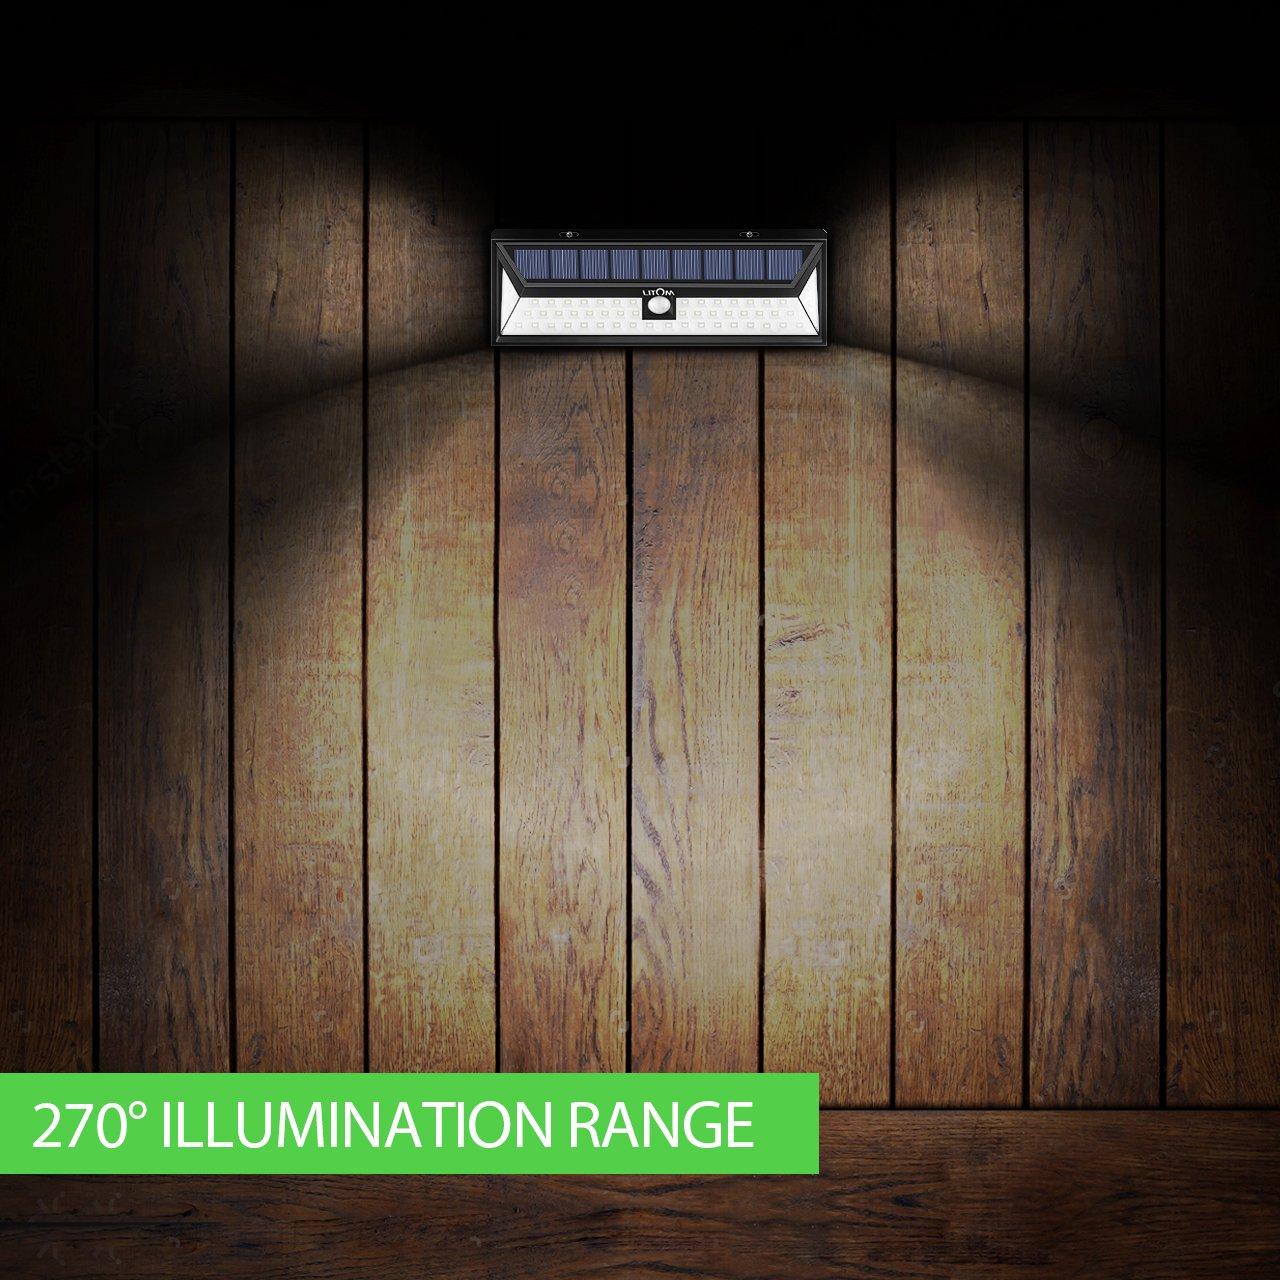 Litom Super Bright Solar Lights 54 LED Solar Power Outdoor Motion Sensor Light With LED on Both Side by Litom (Image #5)